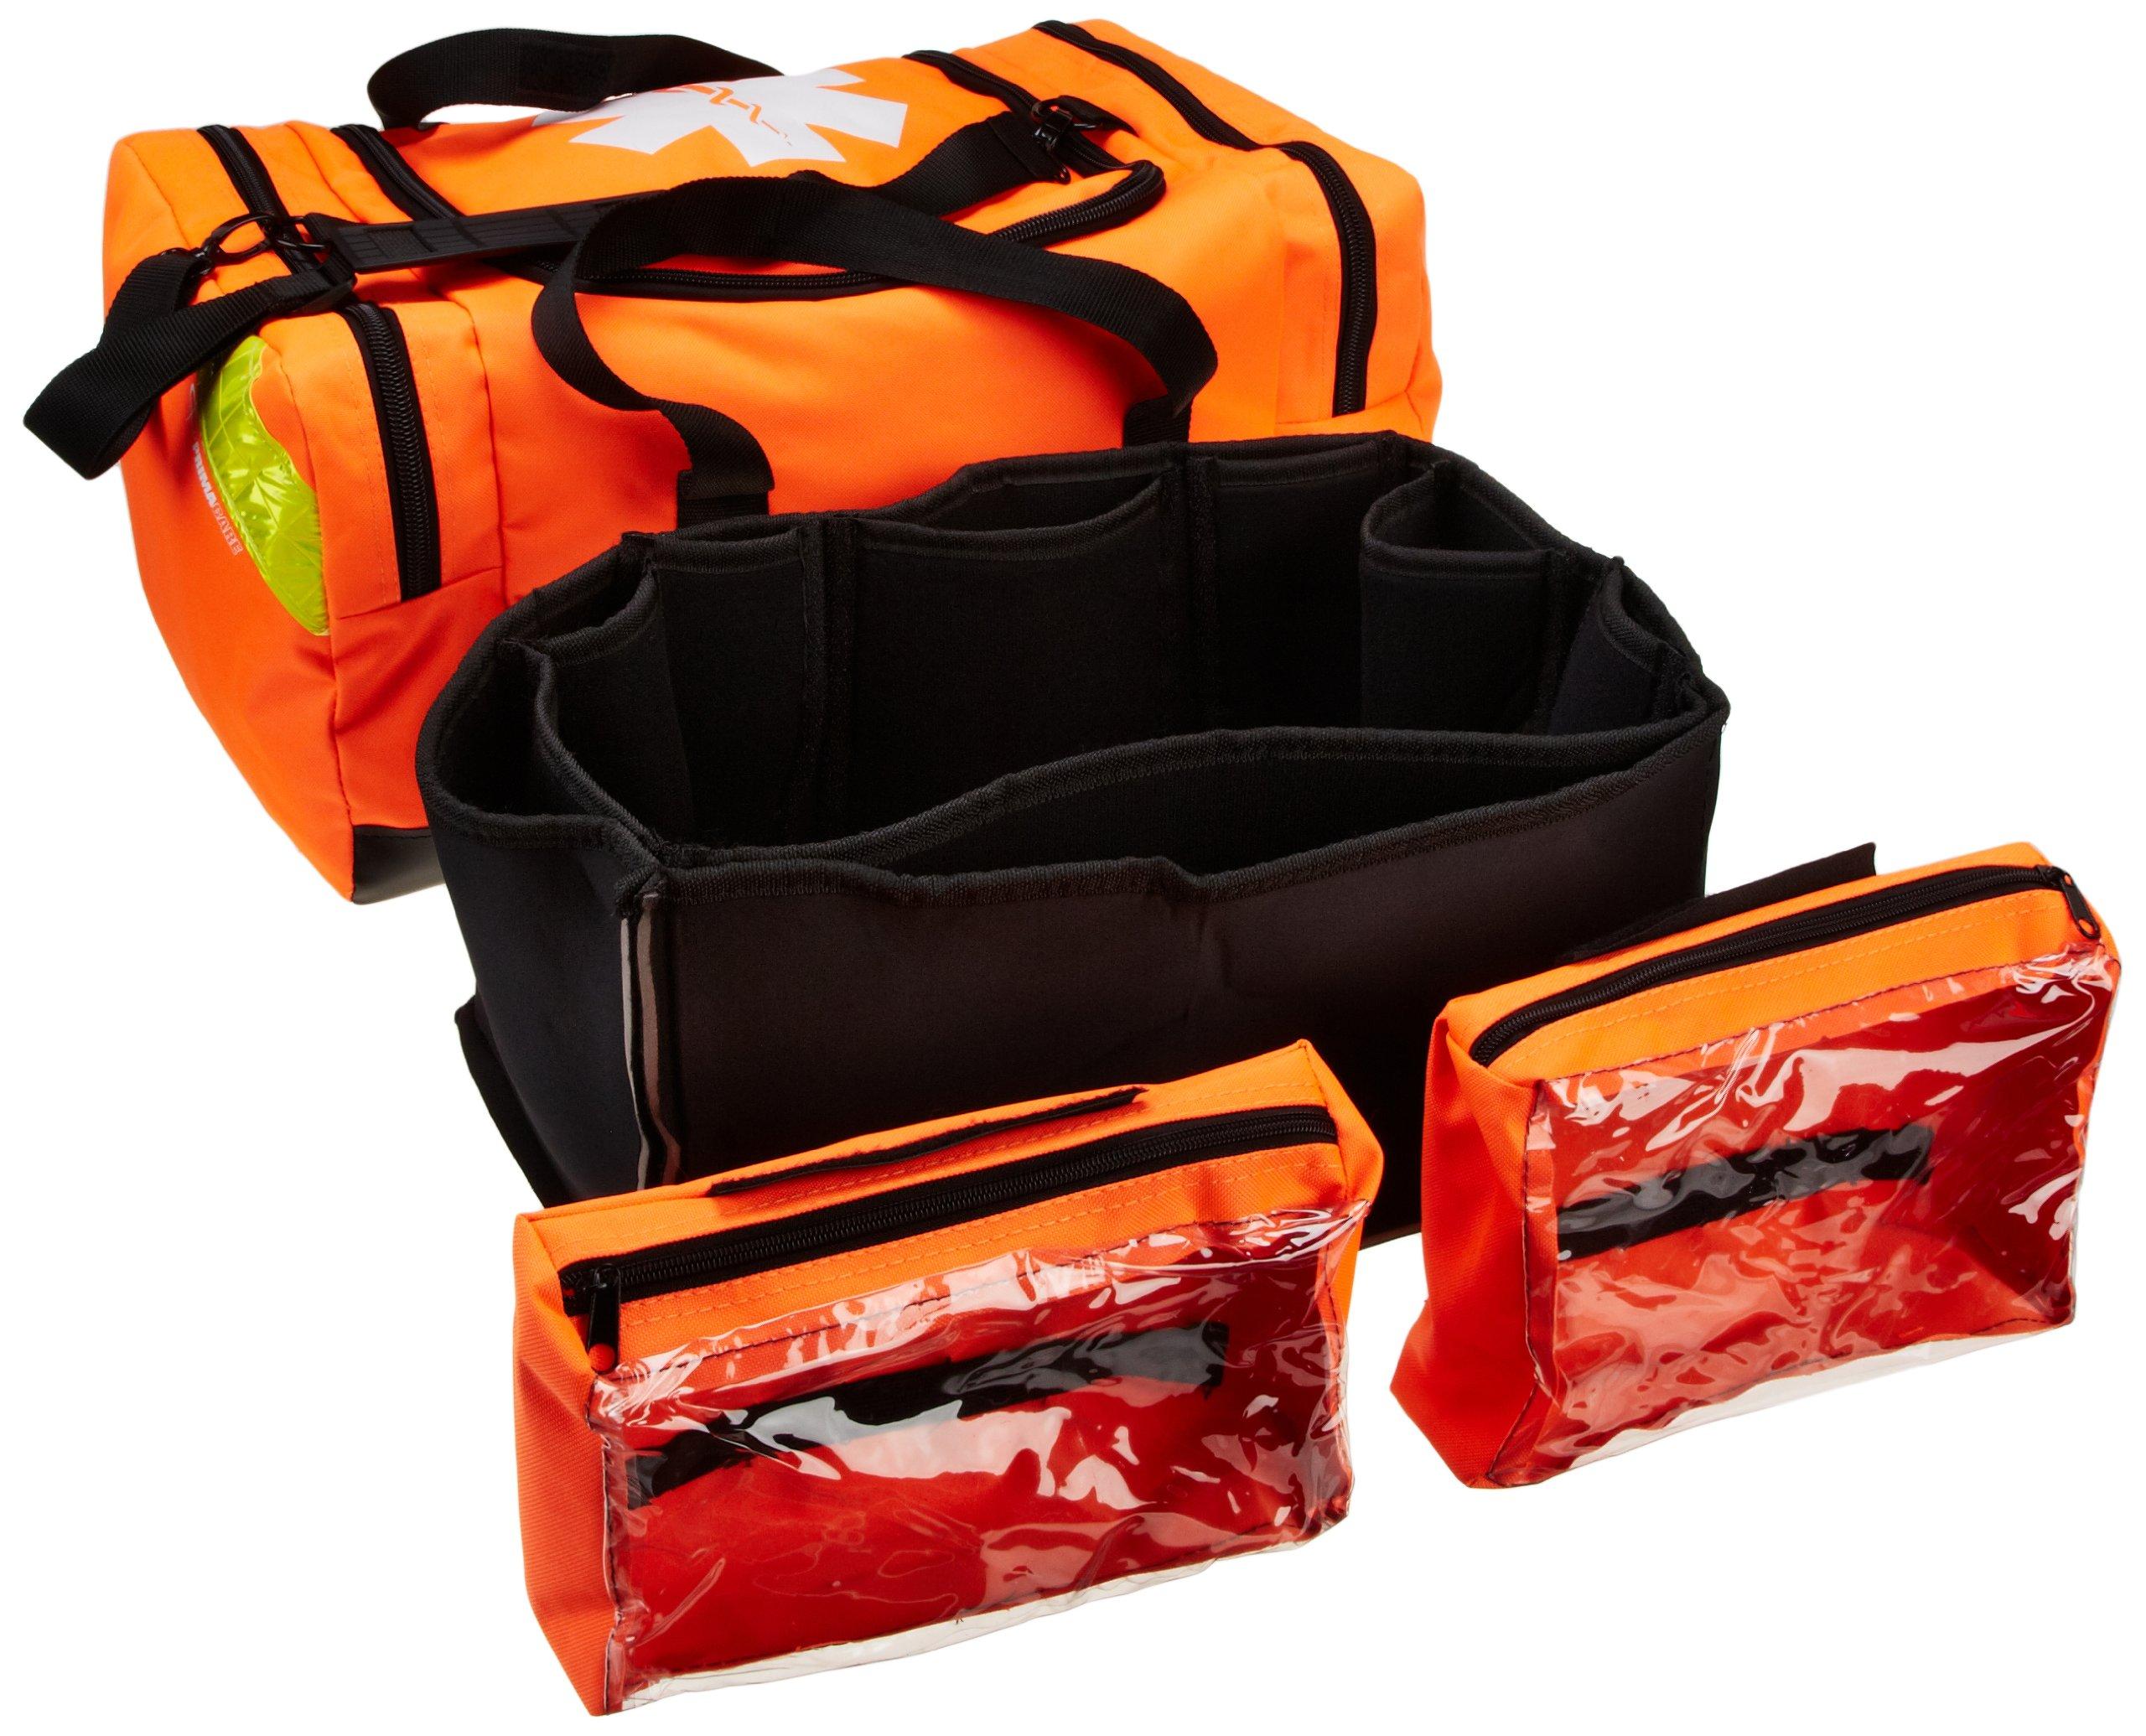 Primacare KB-4135-O First Responder Bag, 21'' Length x 12'' Width x 9'' Height, Orange